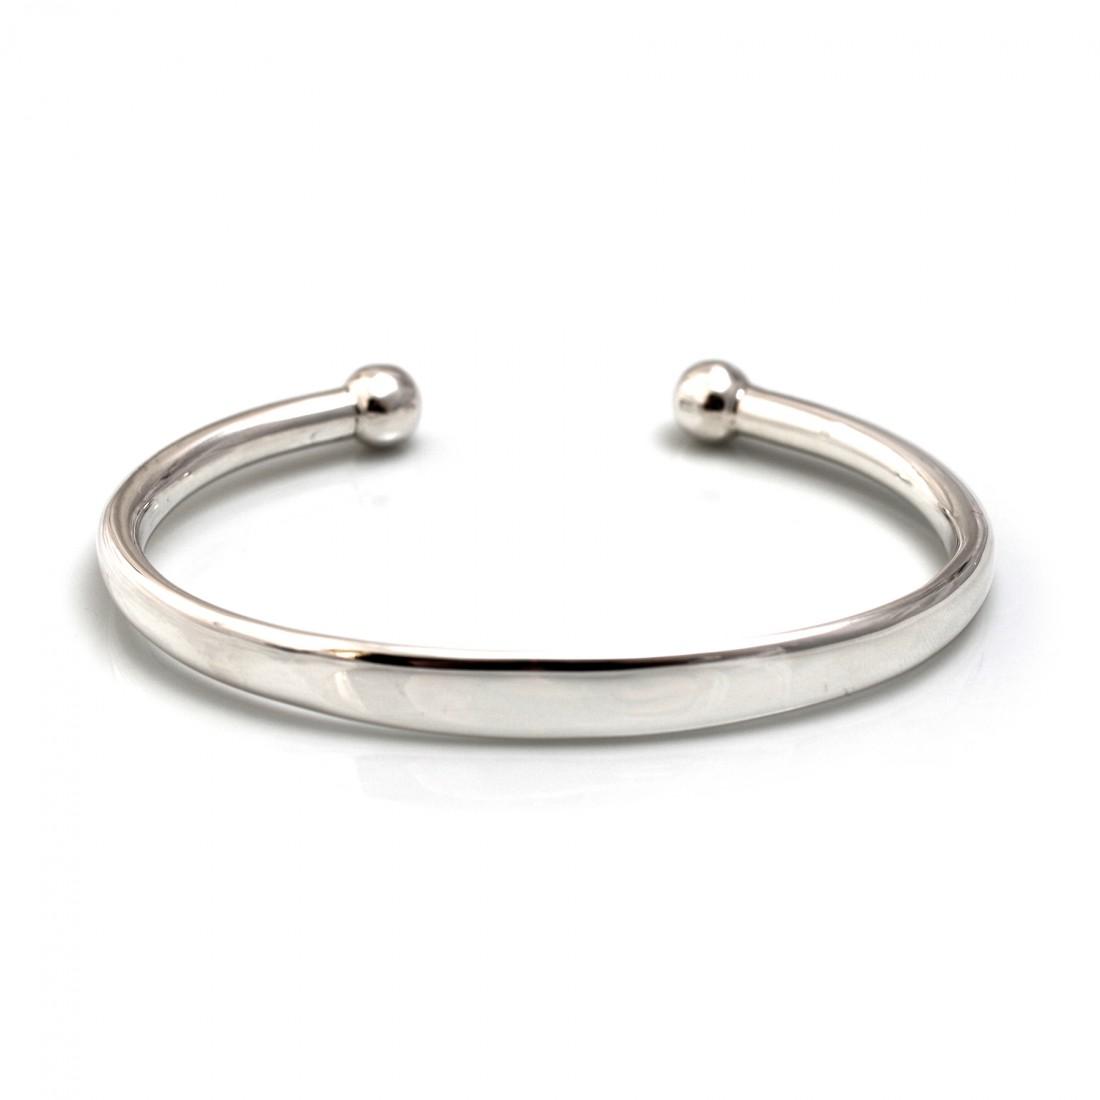 Mens Sterling Silver Cuff Bracelet